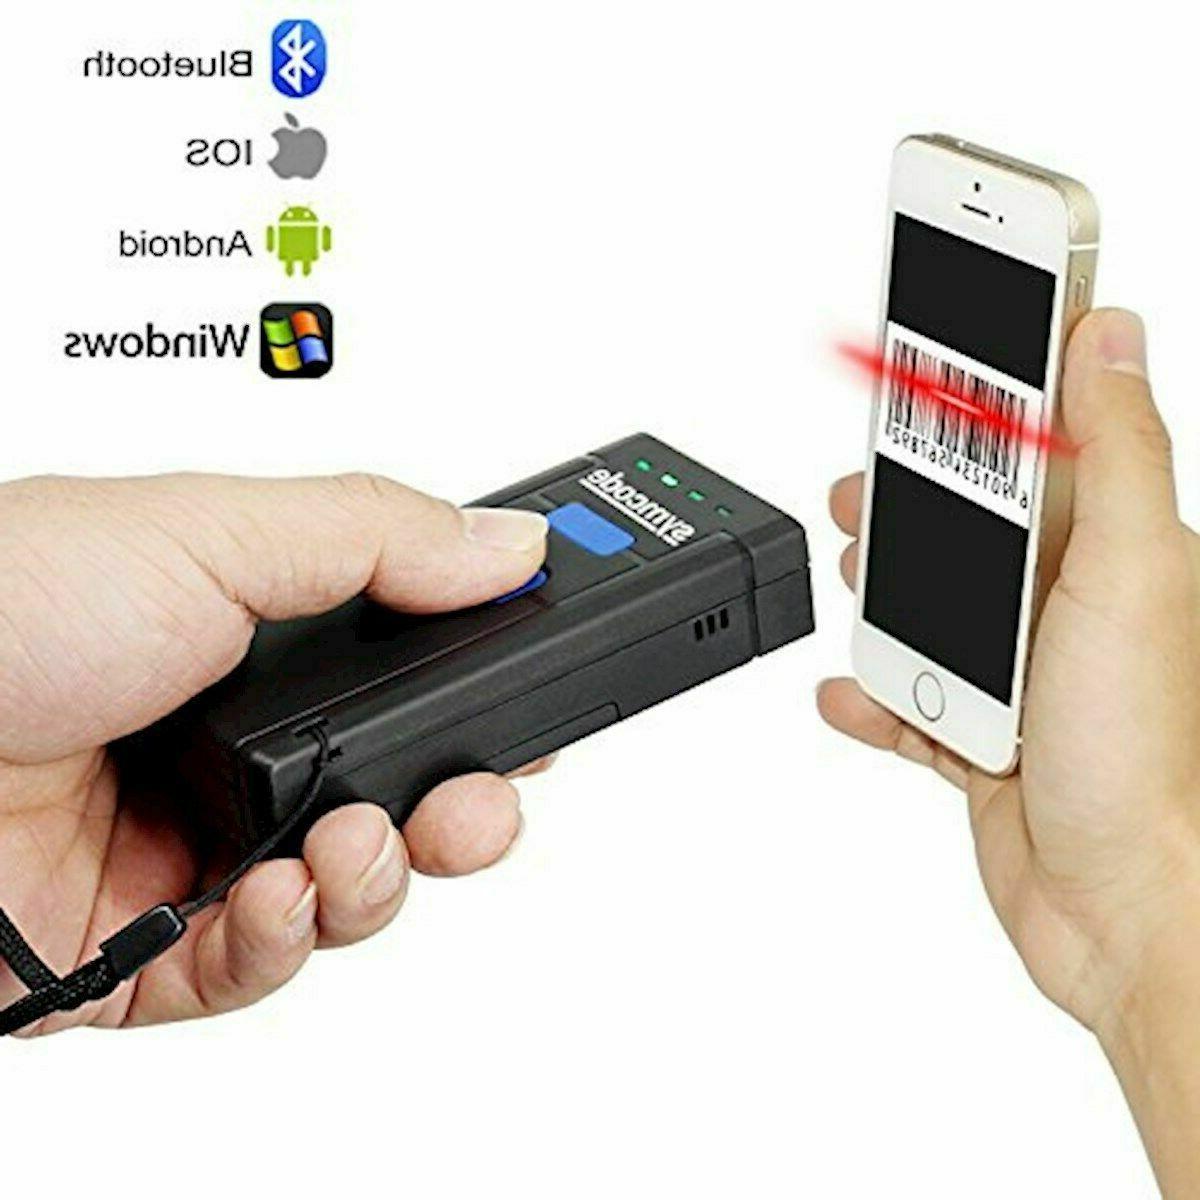 BARCODE SCANNER USB - Symcode MJ-2877